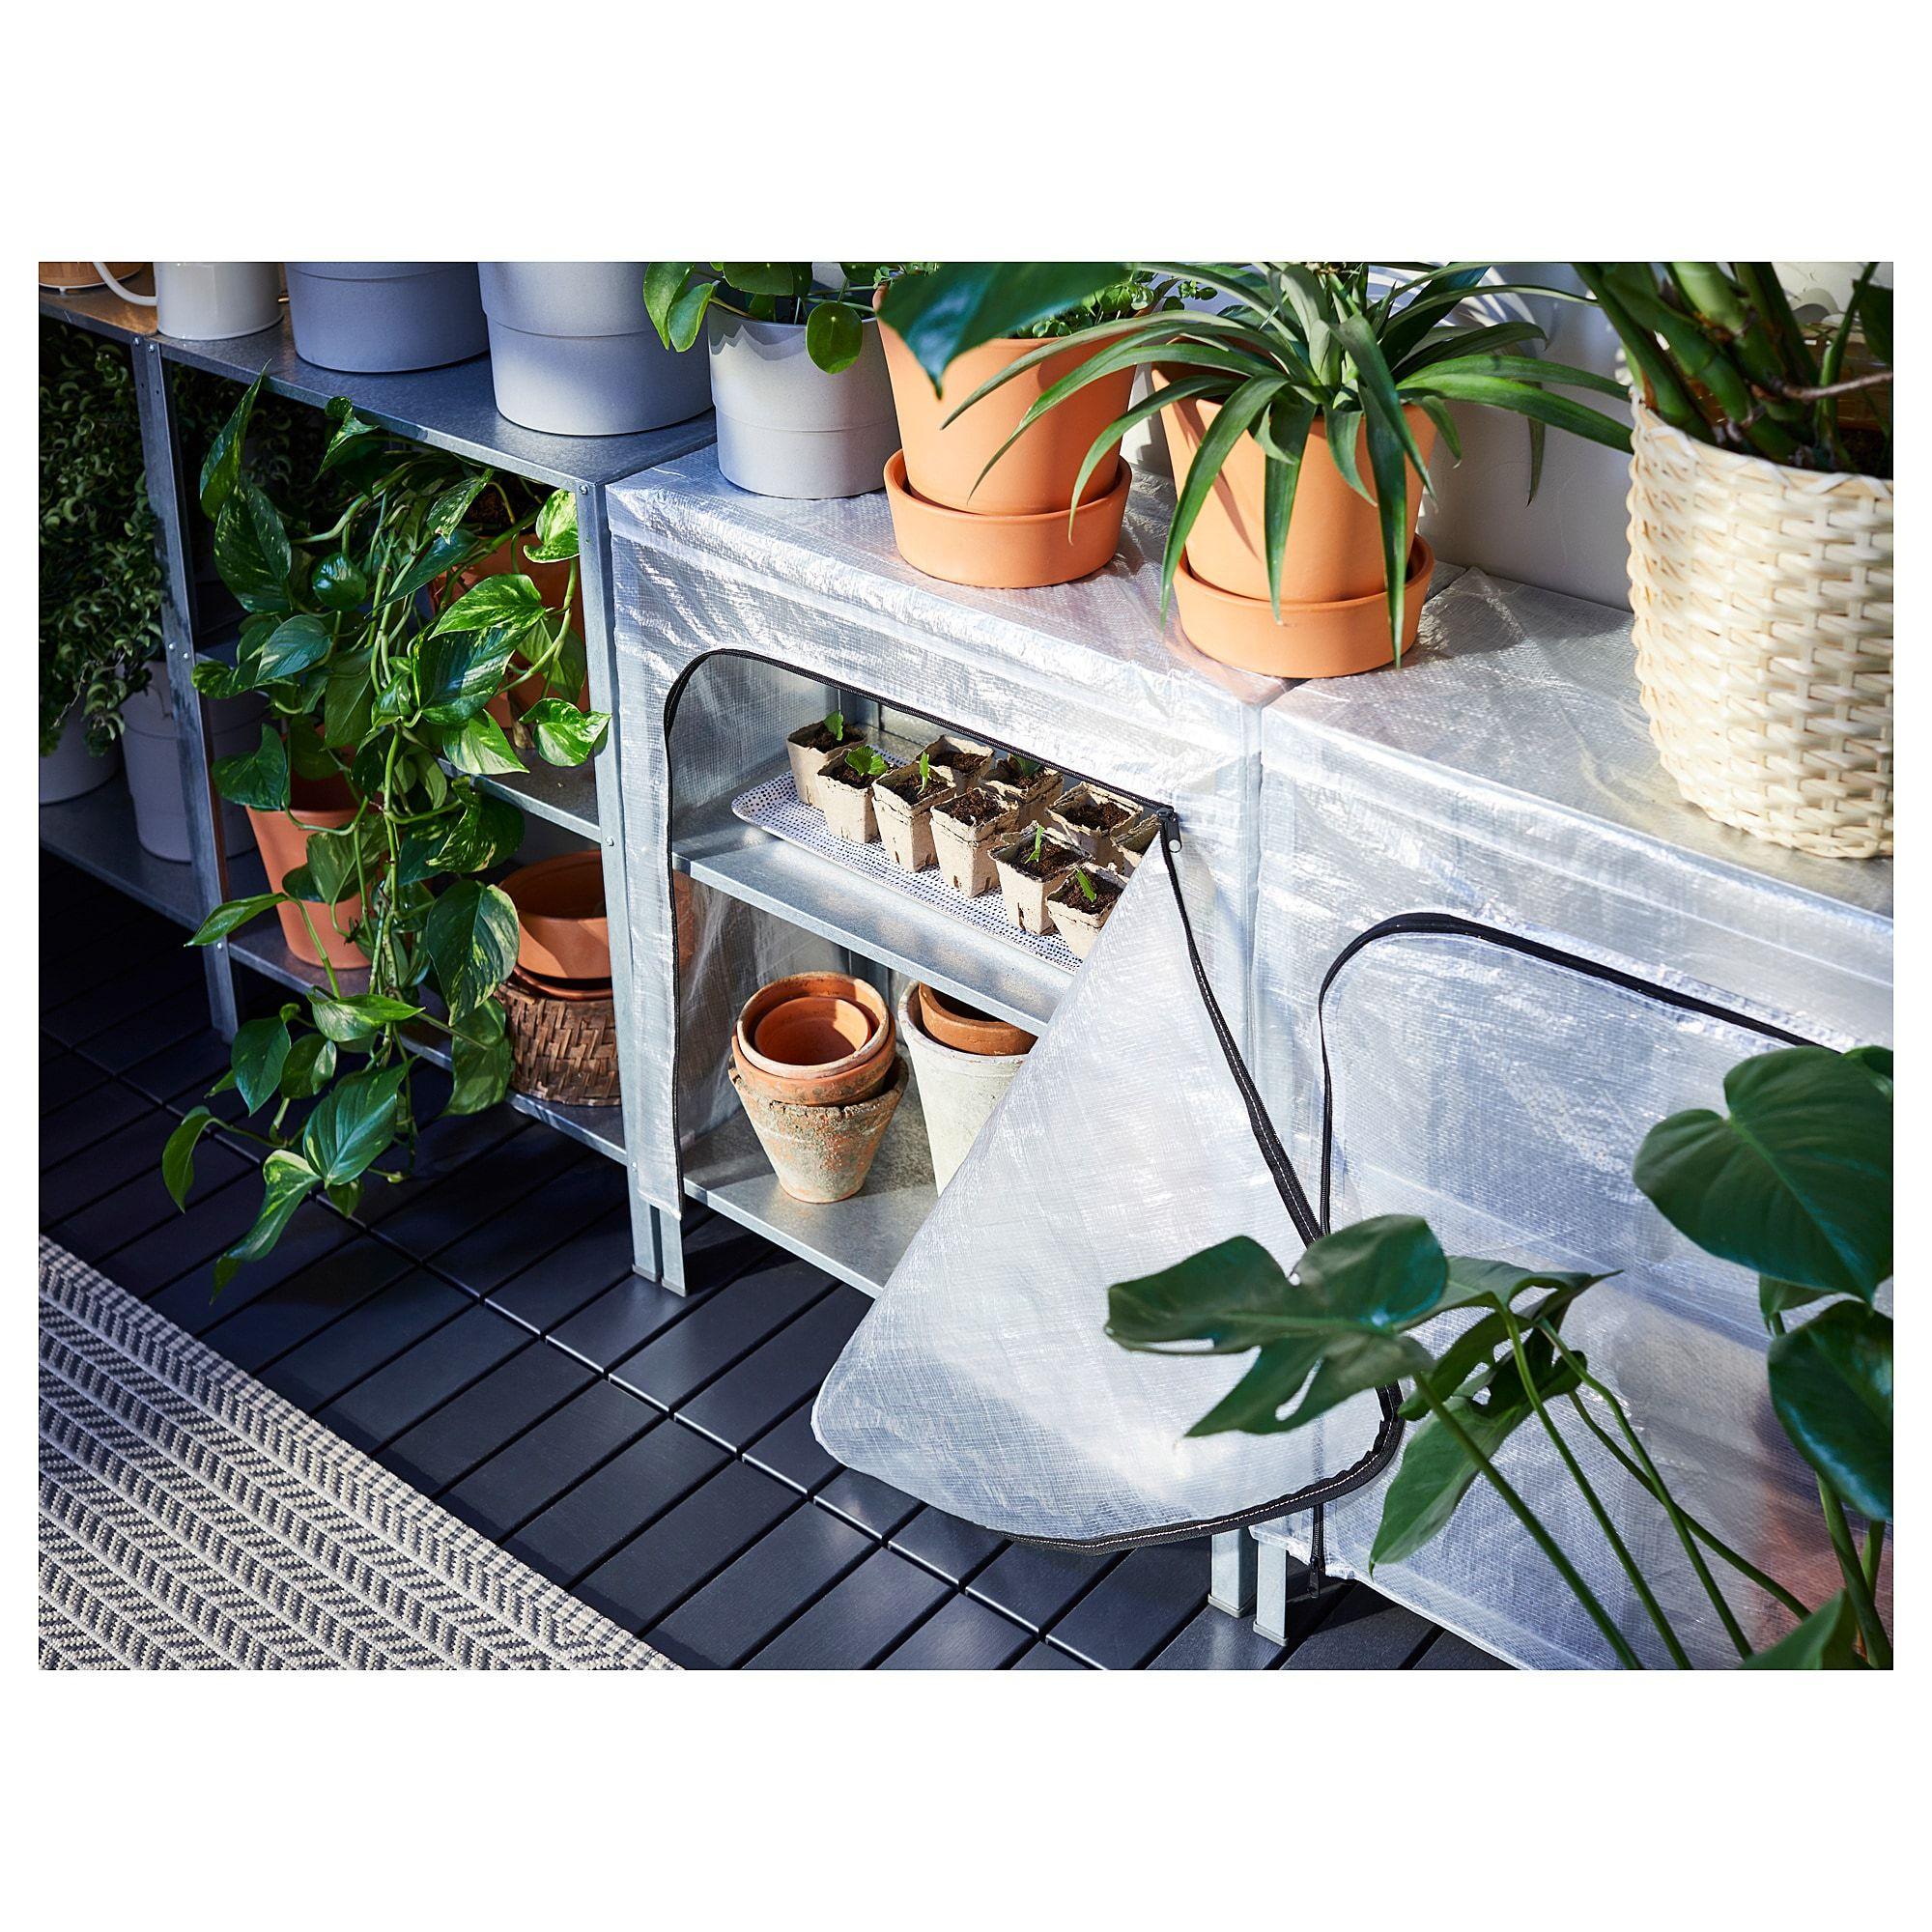 Hyllis Shelving Units With Covers Transparent Ikea Hanging Plants Indoor Ikea Indoor Outdoor